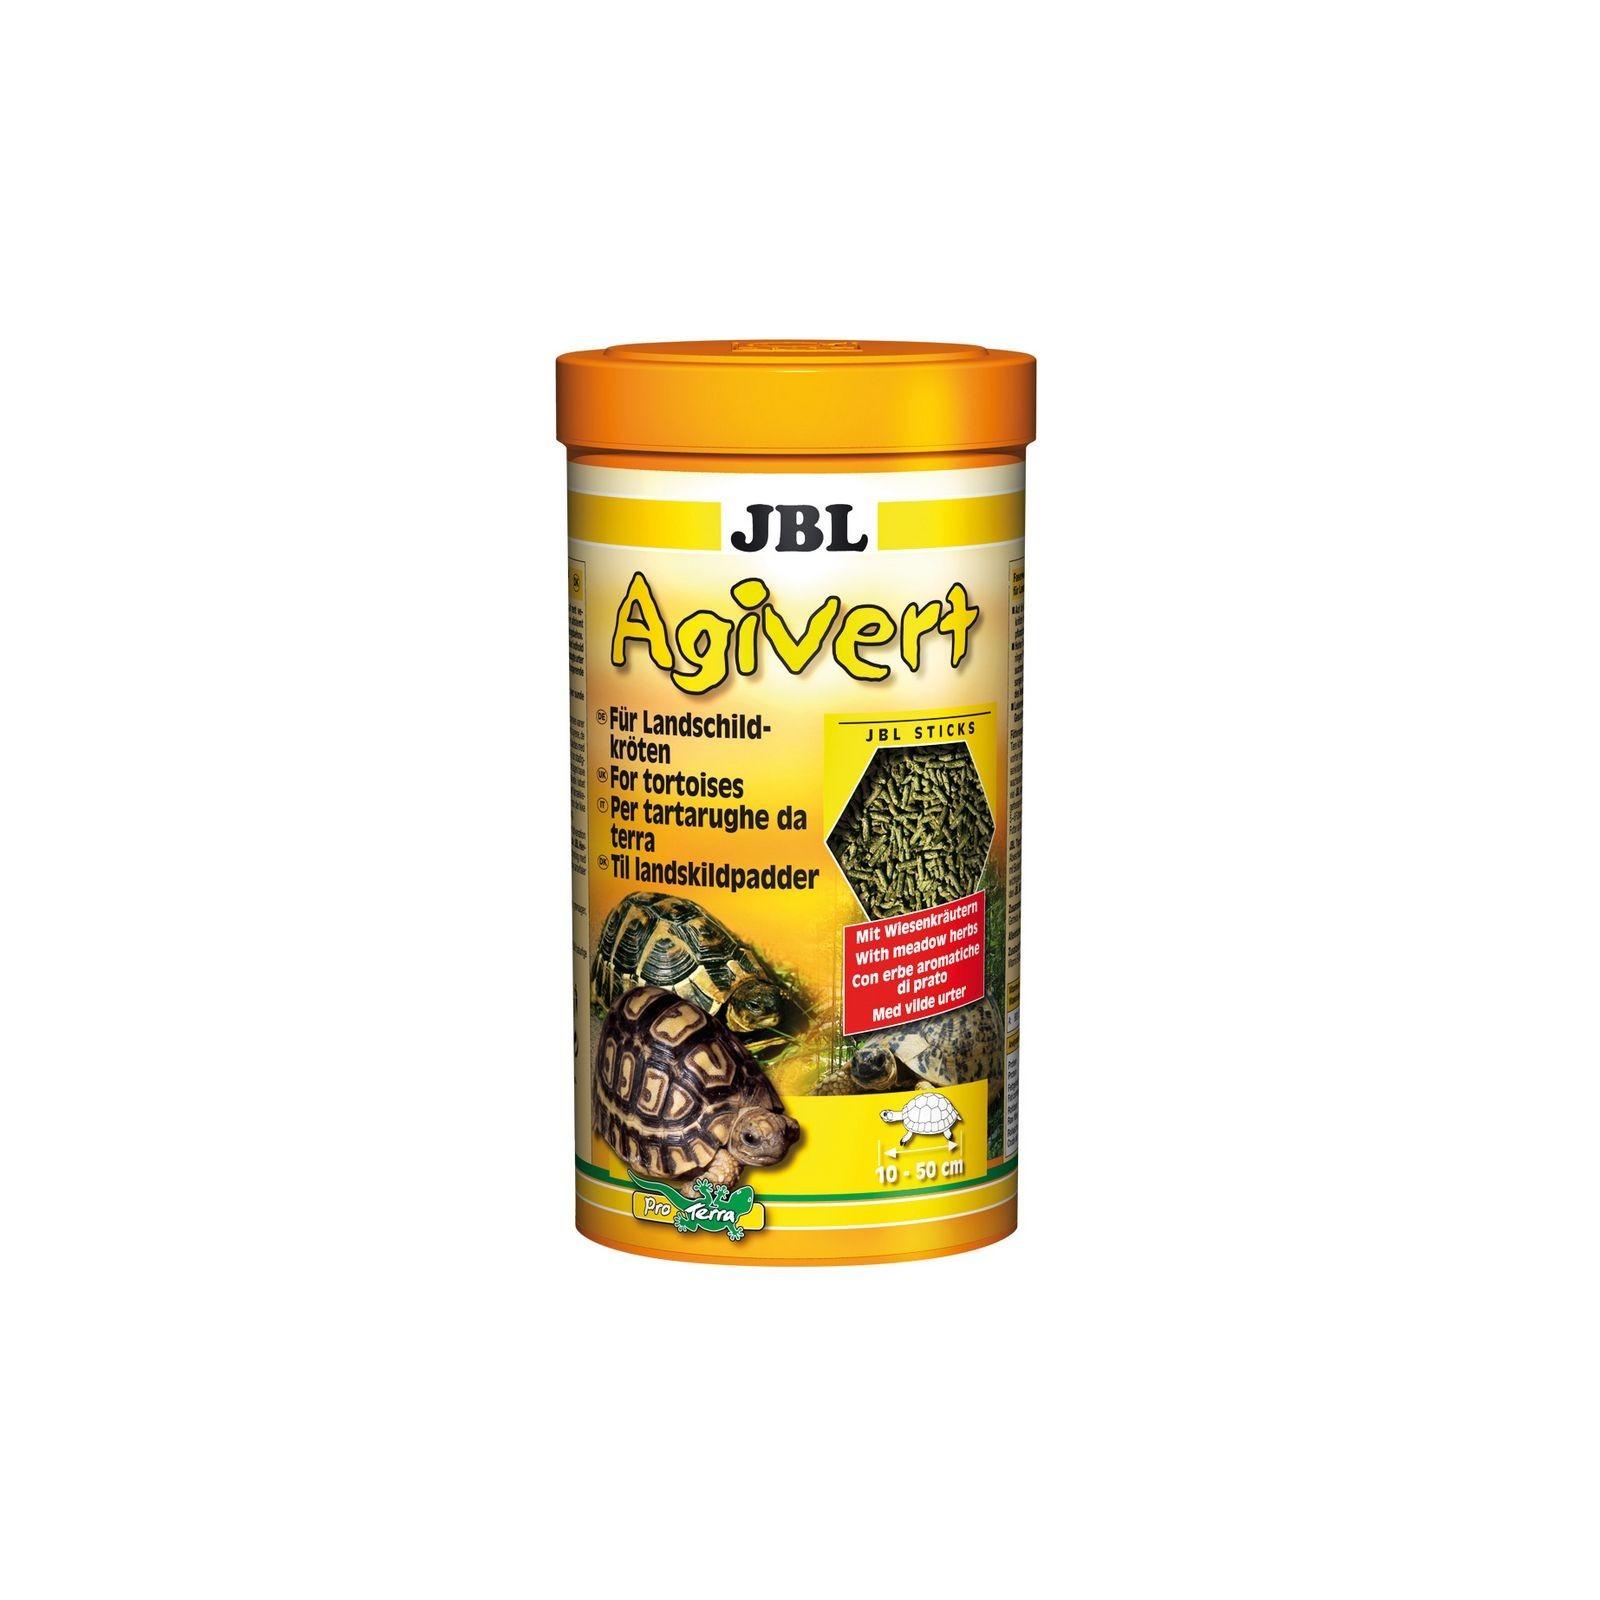 JBL Agivert 1 lt mangime con vitamine per tartarughe di terra